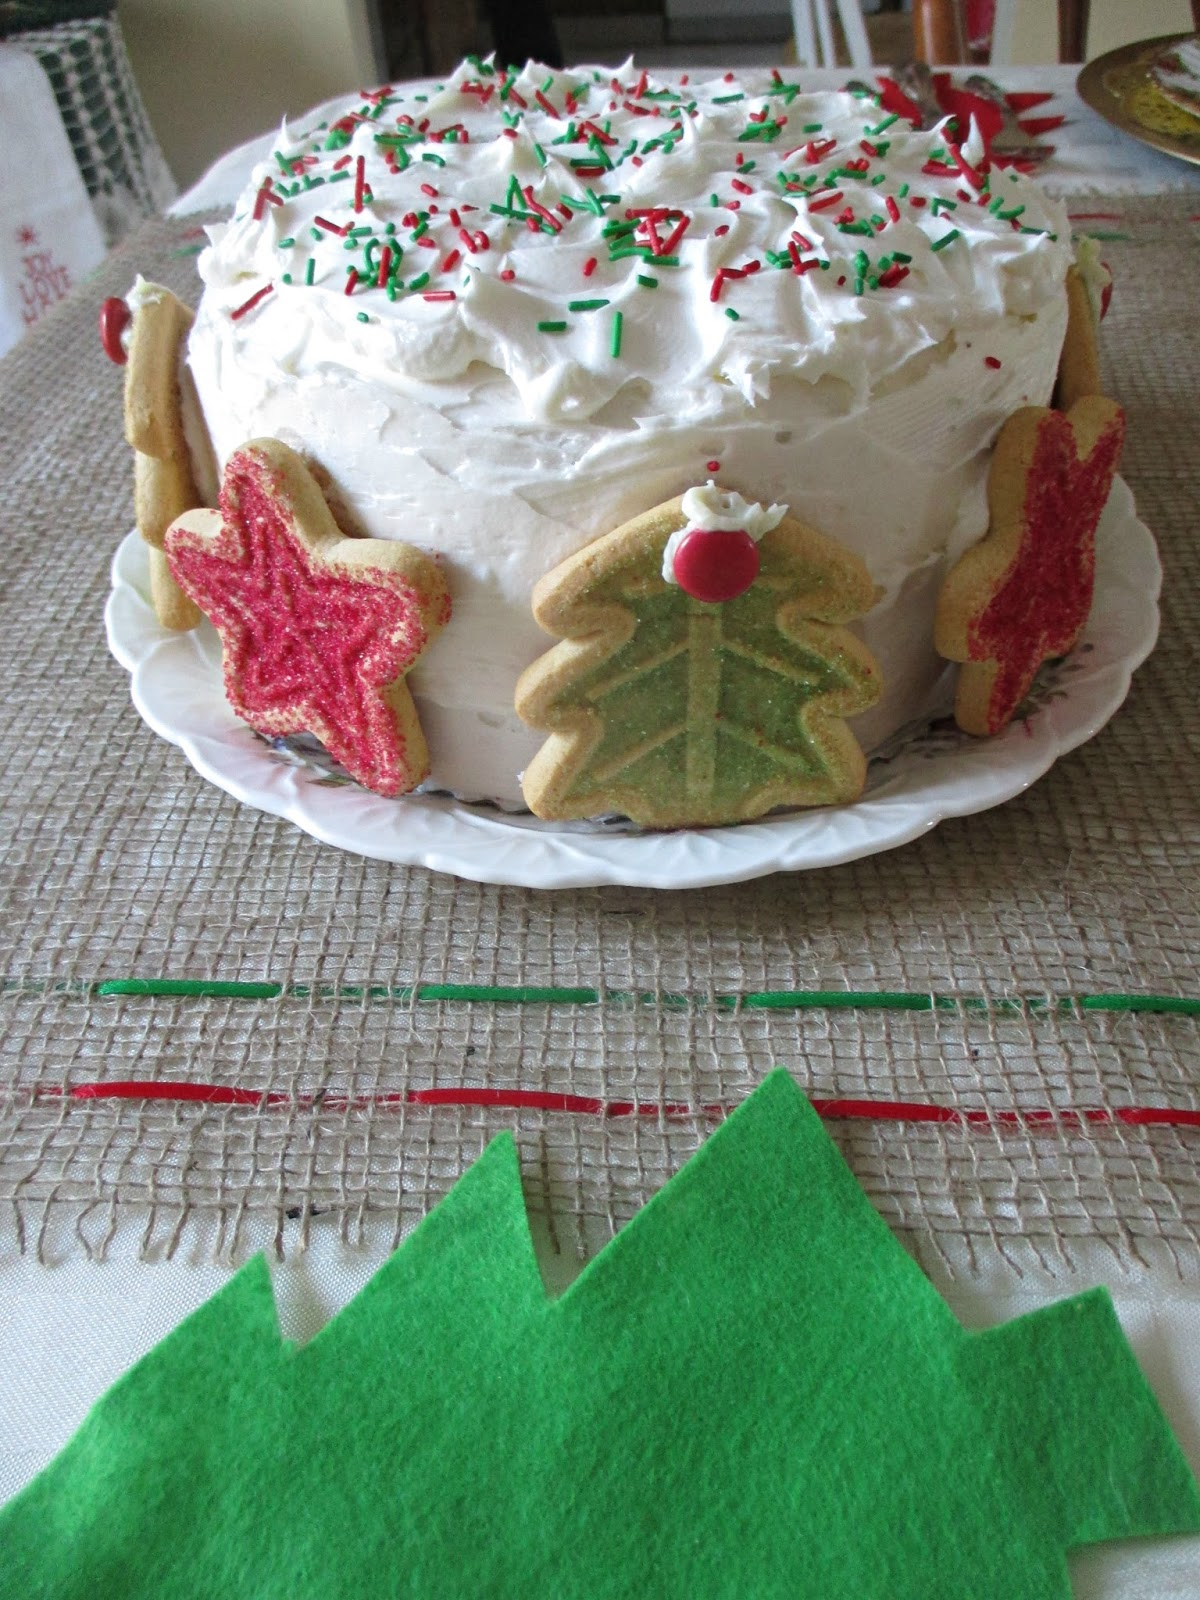 Just my Stuff: December Birthday Cake